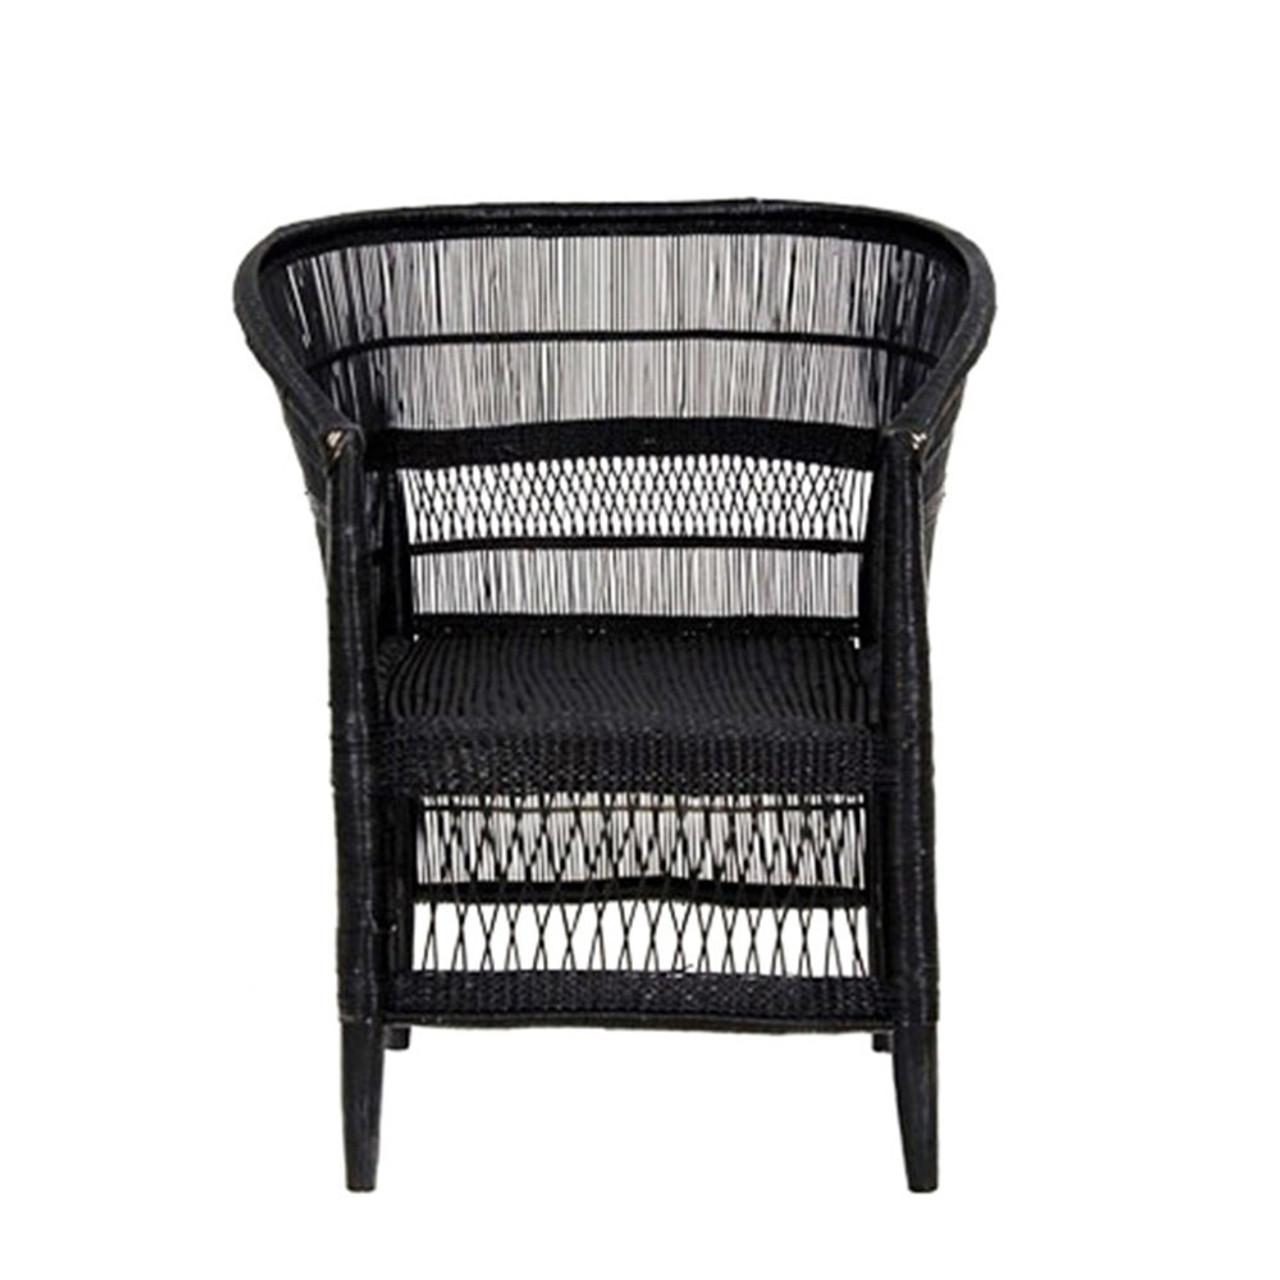 Admirable Malawi Cane Chair Black Inzonedesignstudio Interior Chair Design Inzonedesignstudiocom